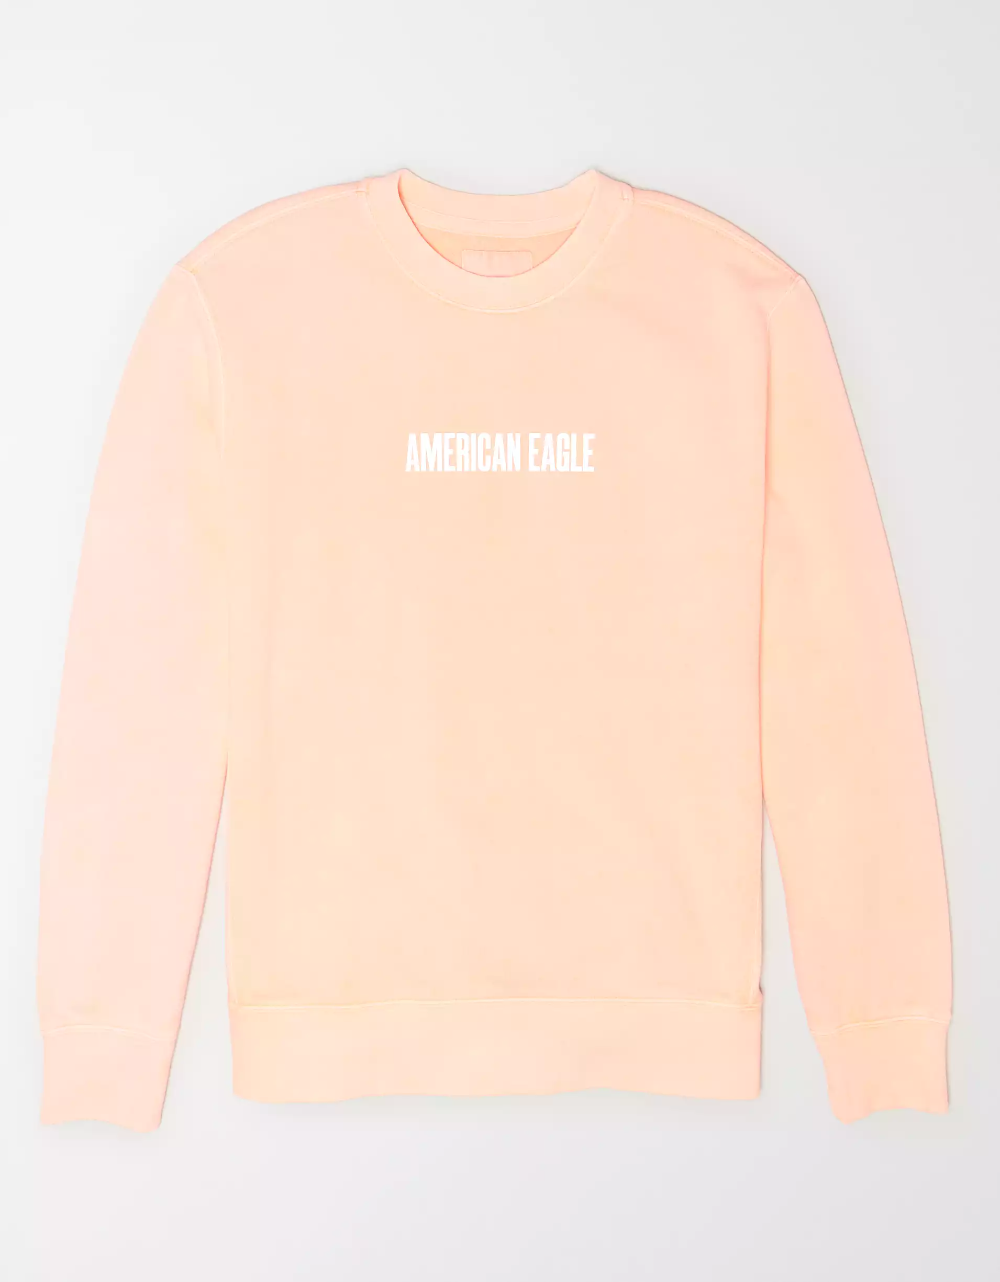 Ae Garment Dyed Graphic Crew Neck Sweatshirt Graphic Crew Neck Sweatshirts Crew Neck Sweatshirt Sweatshirts [ 1282 x 1000 Pixel ]